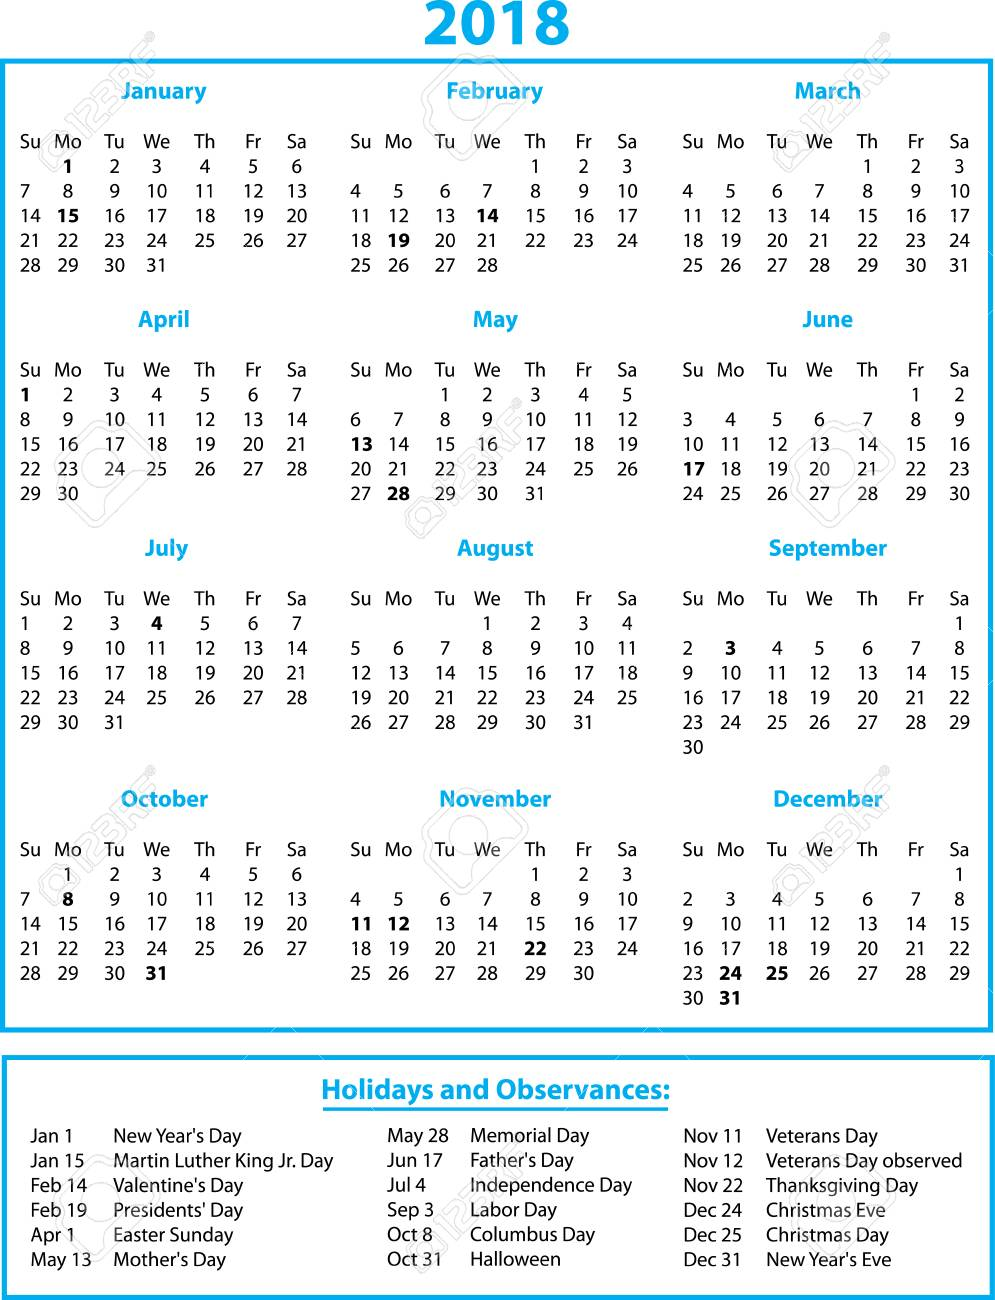 Calendario Con Festivita.Calendario 2018 Blu Con Mesi E Festivita